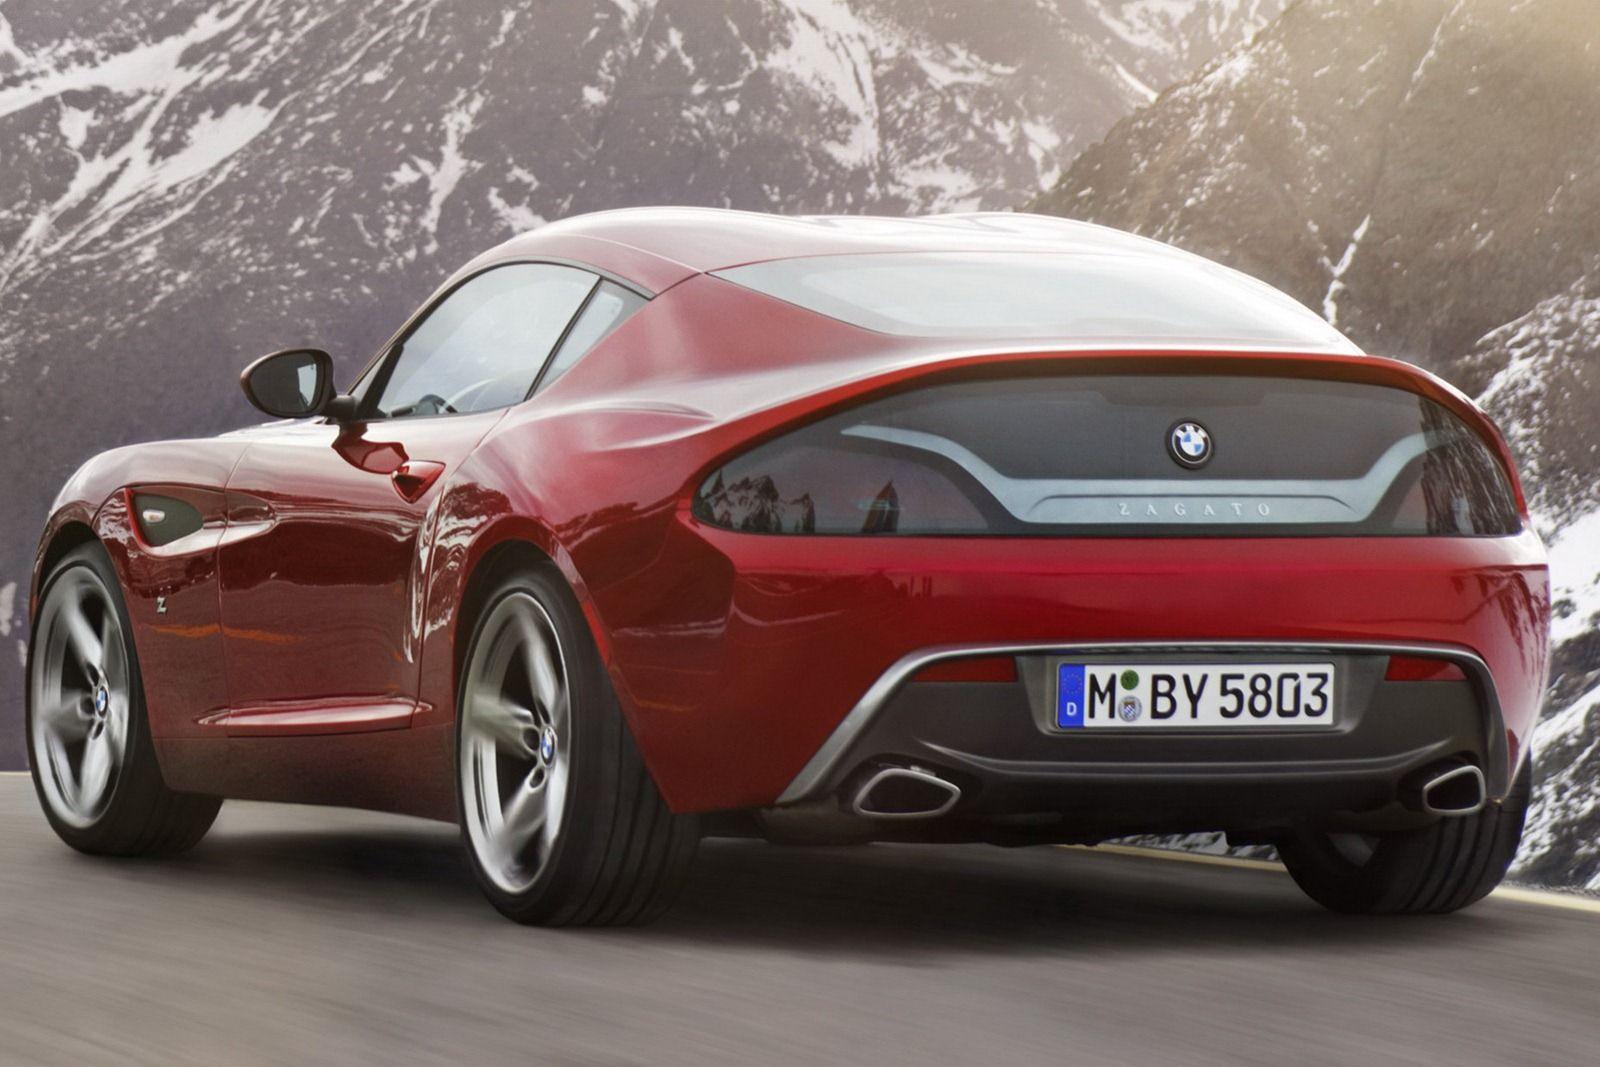 BMW Zagato Roadster - Pebble Beach 2012 Autoblog Español | autos ...